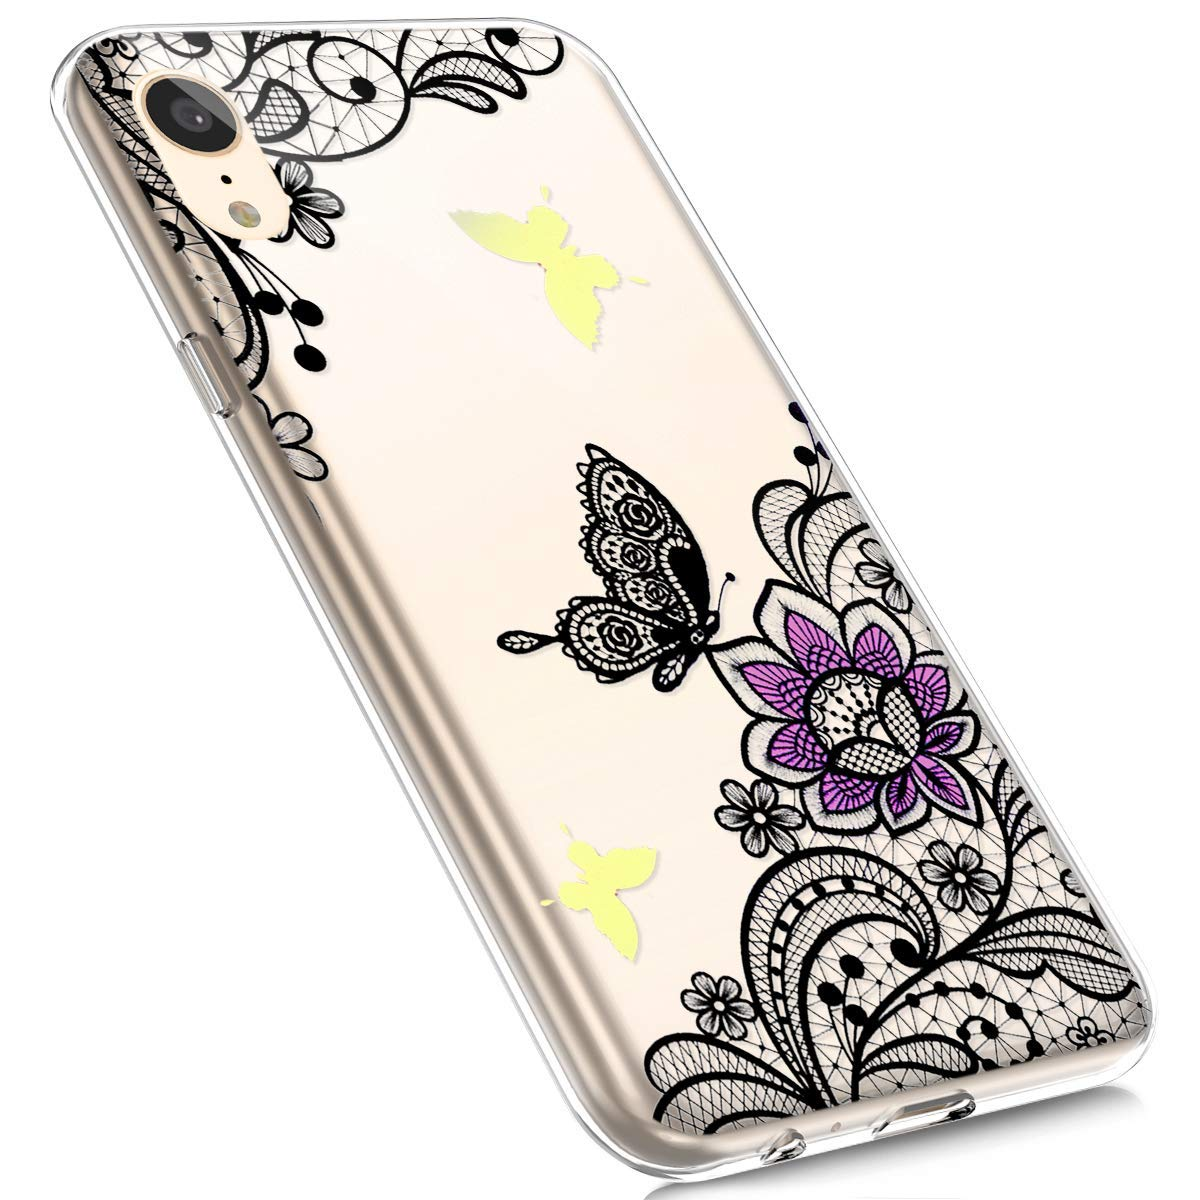 MoreChioce kompatibel mit iPhone XR Hü lle, Silikon Hü lle kompatibel iPhone XR Durchsichtig TPU Schutzhü lle Bumper Bunt Muster Transparent Kristall Handyhü lle